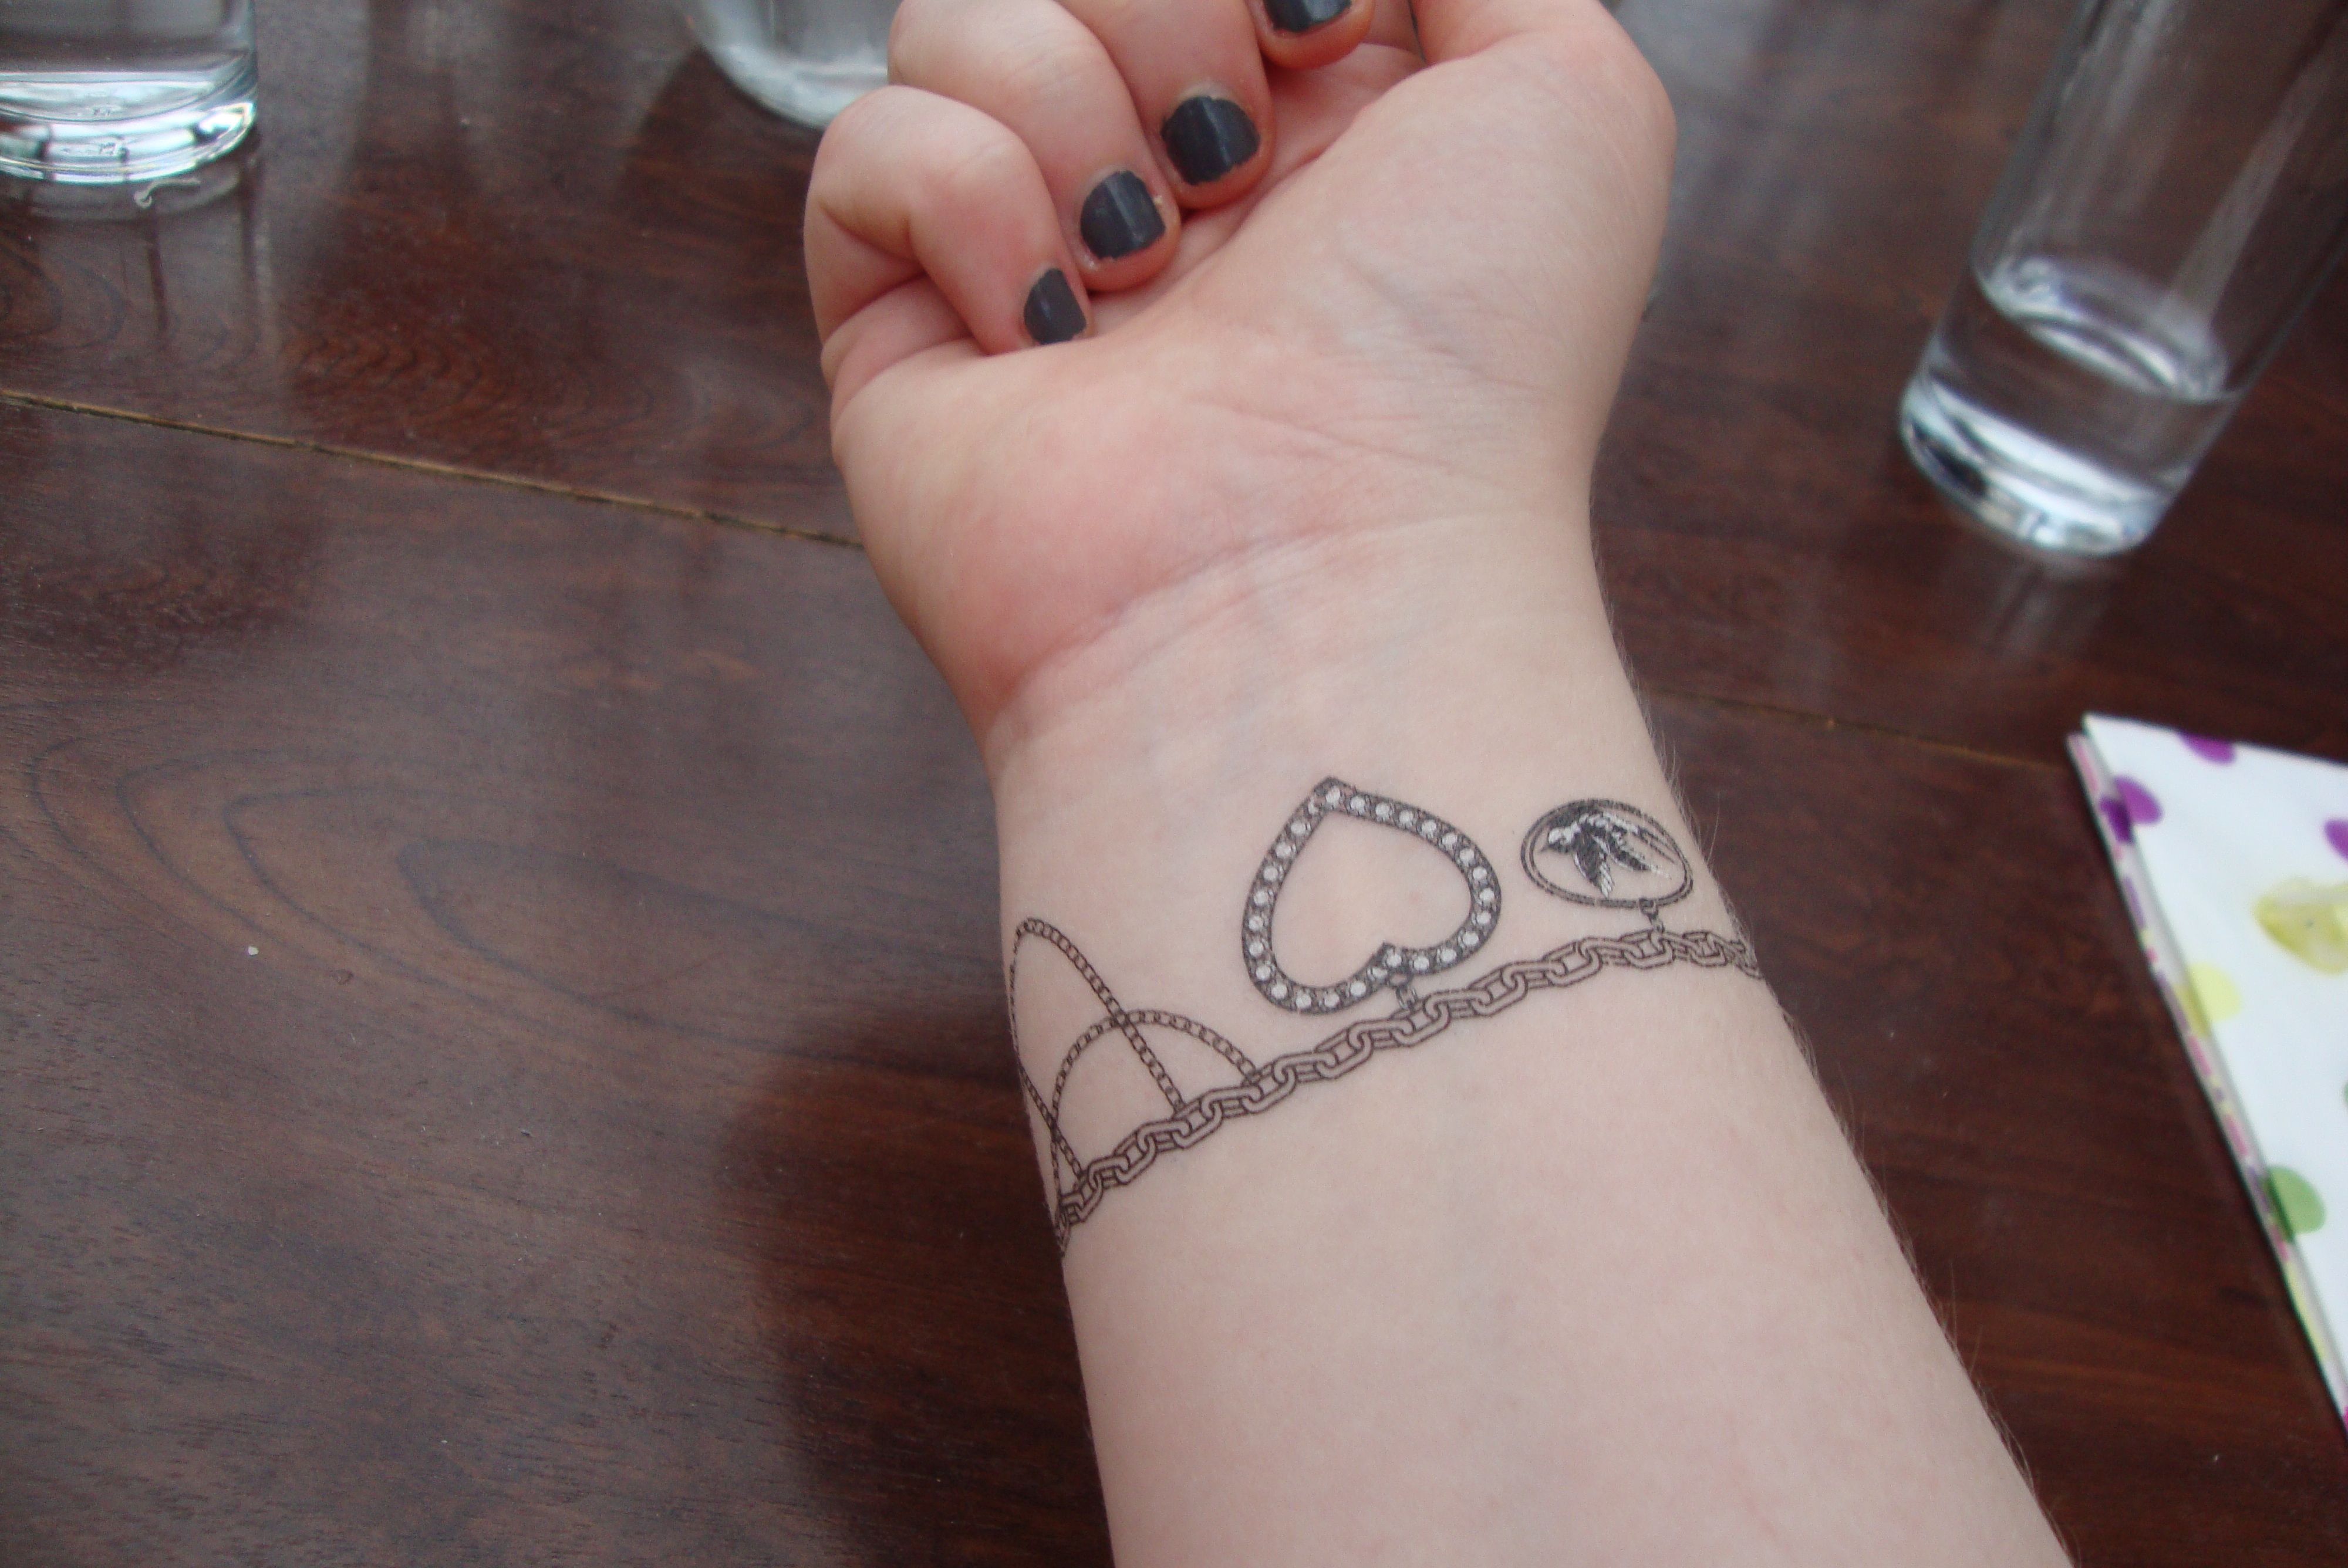 Pin by anna curlee on tattatoos i uc pinterest tattoo bracelet